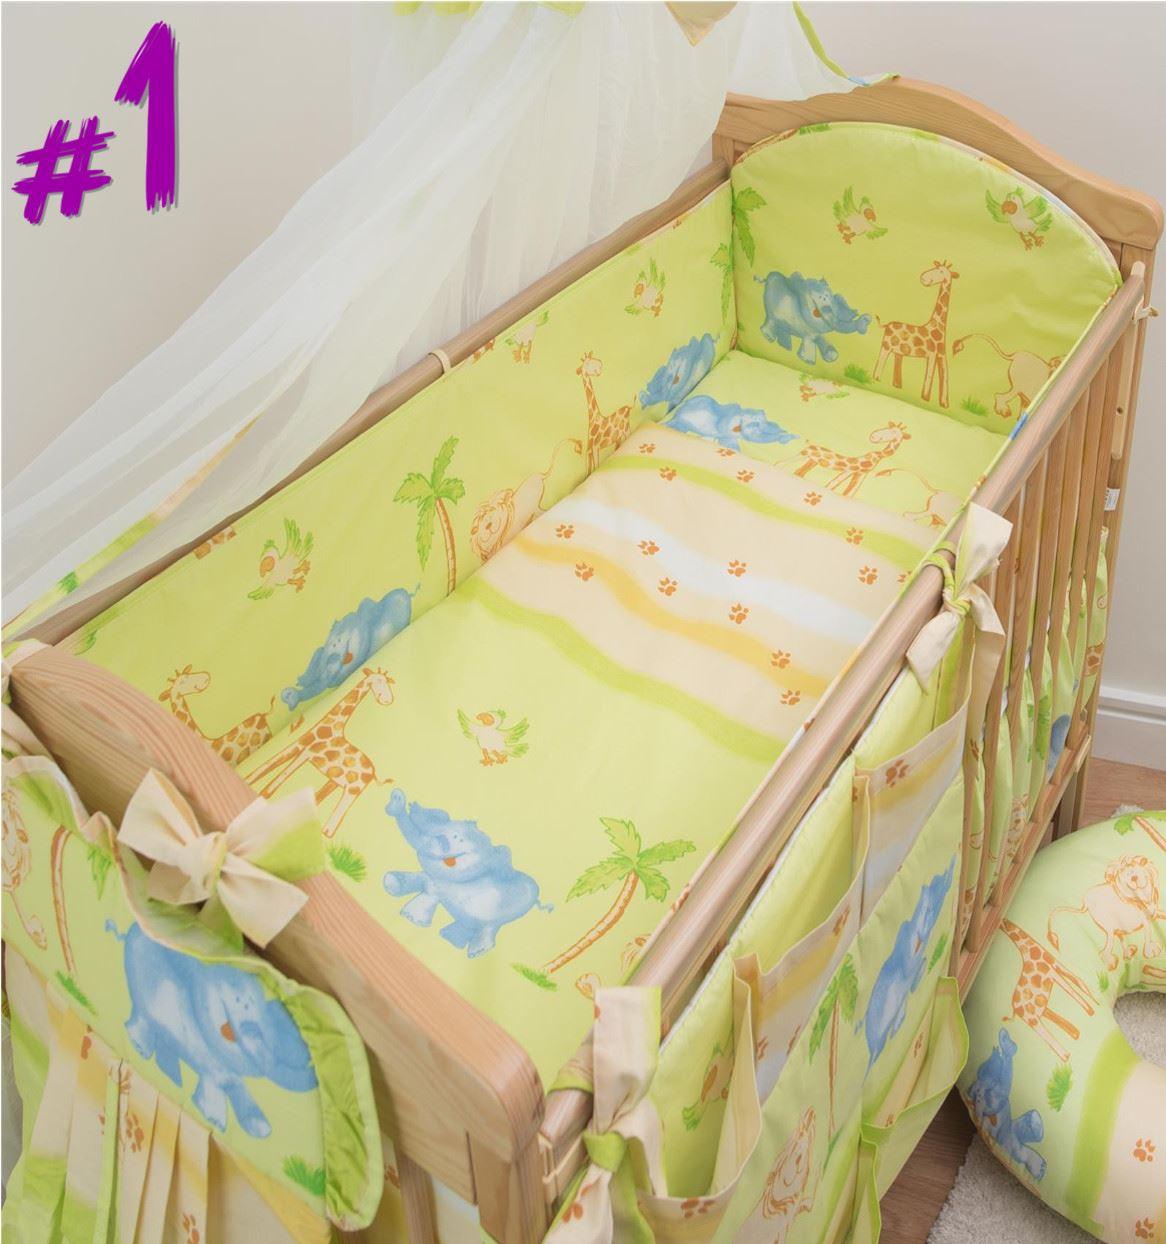 3 teile kinderzimmer kinderbett bettw sche set mit gro en - Kinderbett set ...